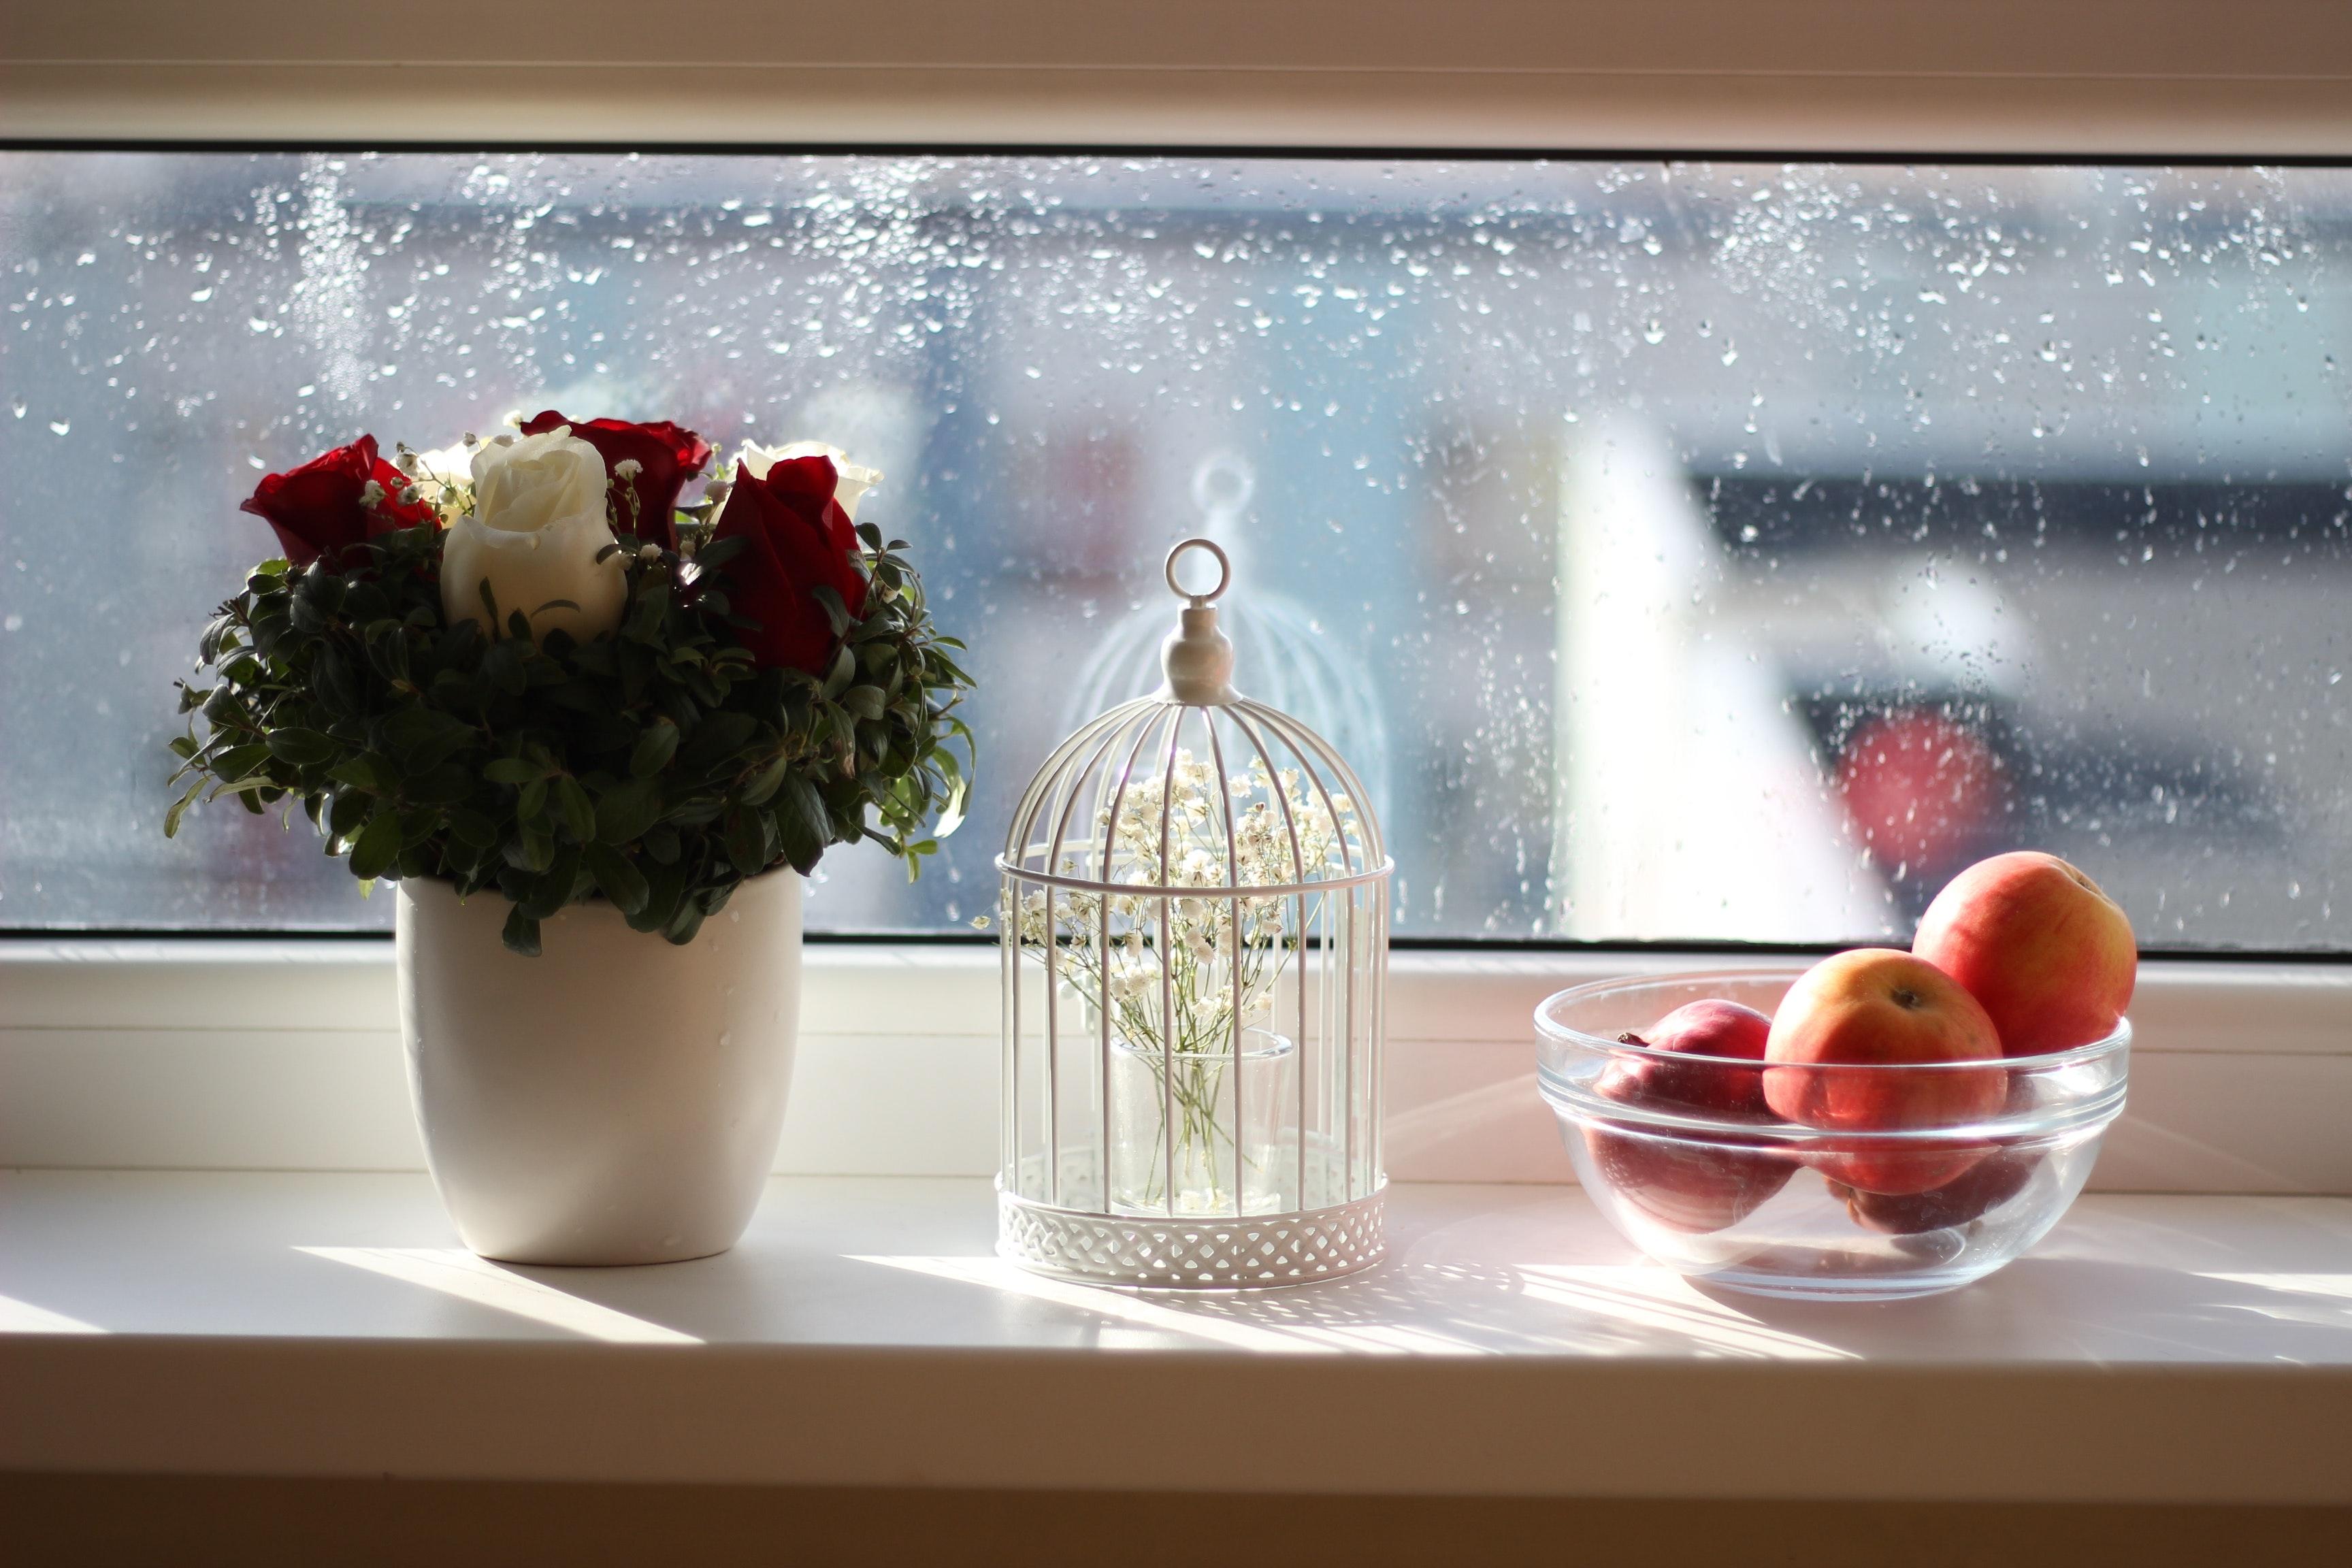 Apples in Ball Near Flowers in Vase Interior Inside Indoors Interior design & Free photo: Apples in Ball Near Flowers in Vase - Interior Inside ...